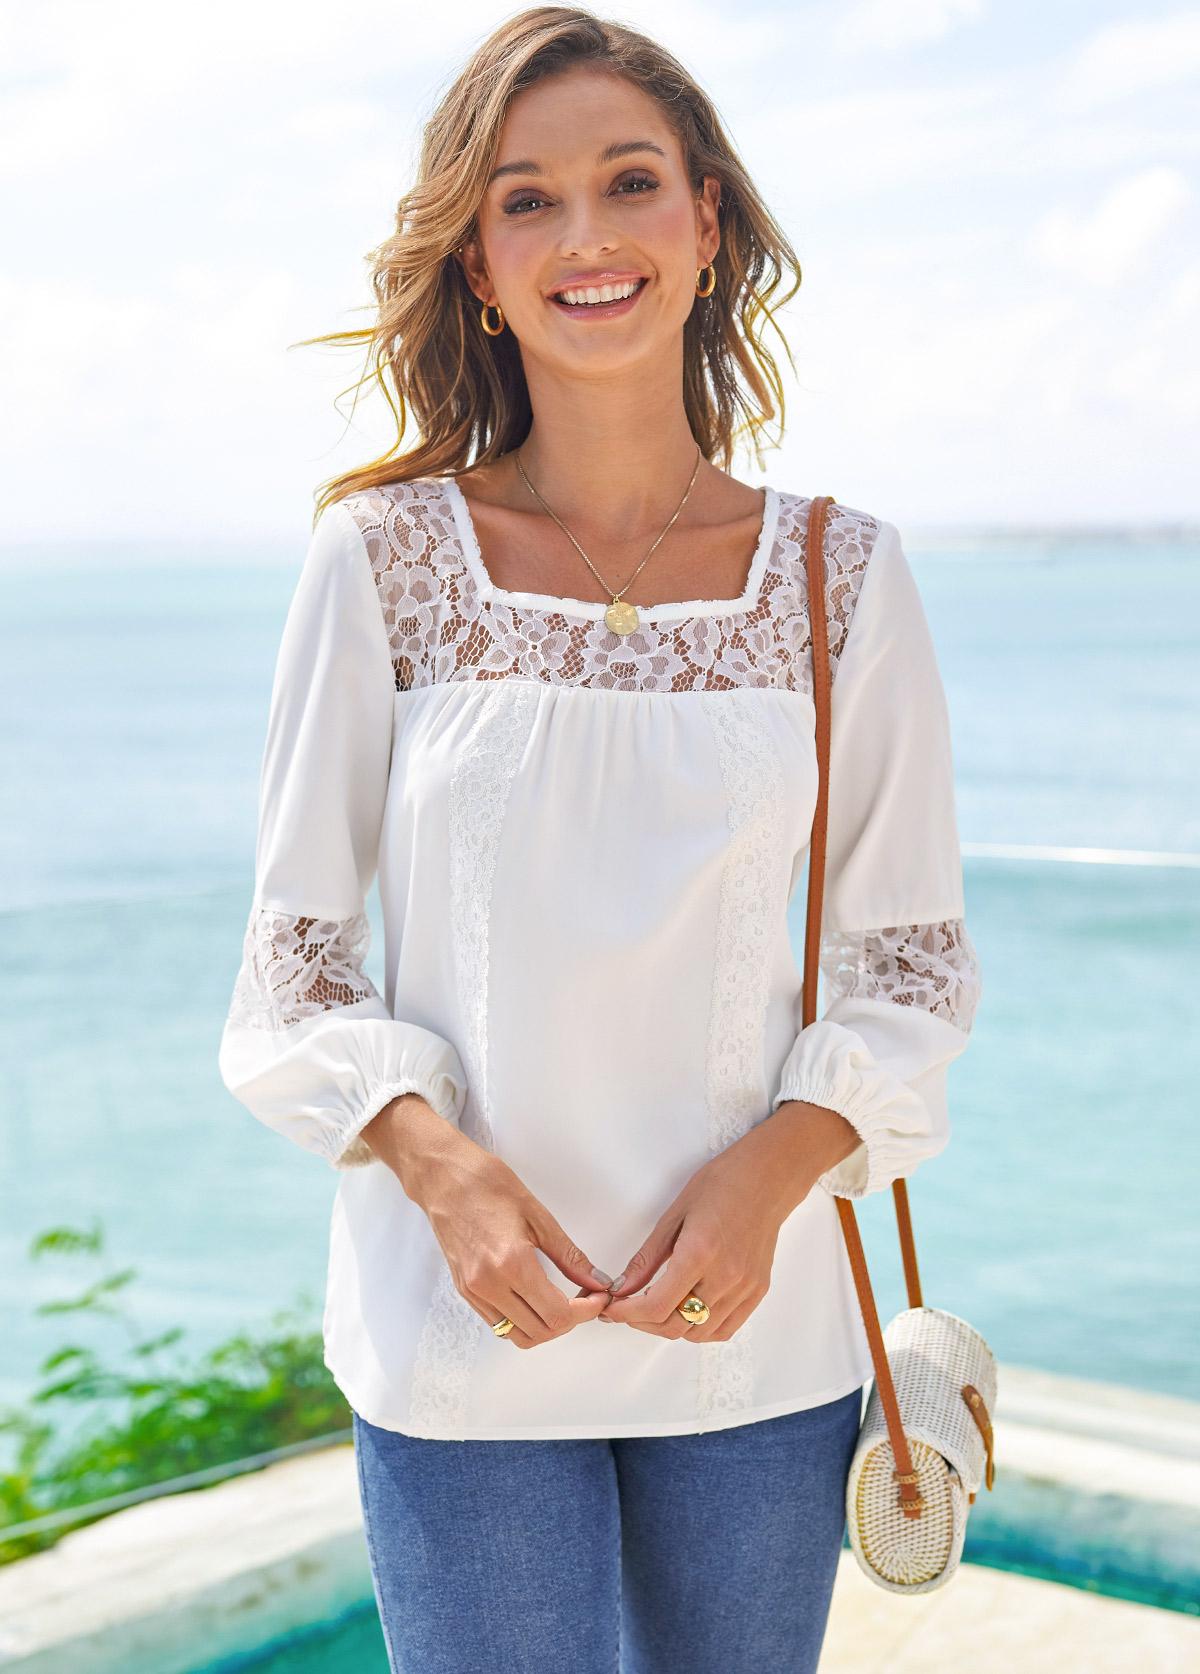 Square Neck Lace Stitching 3/4 Sleeve T Shirt